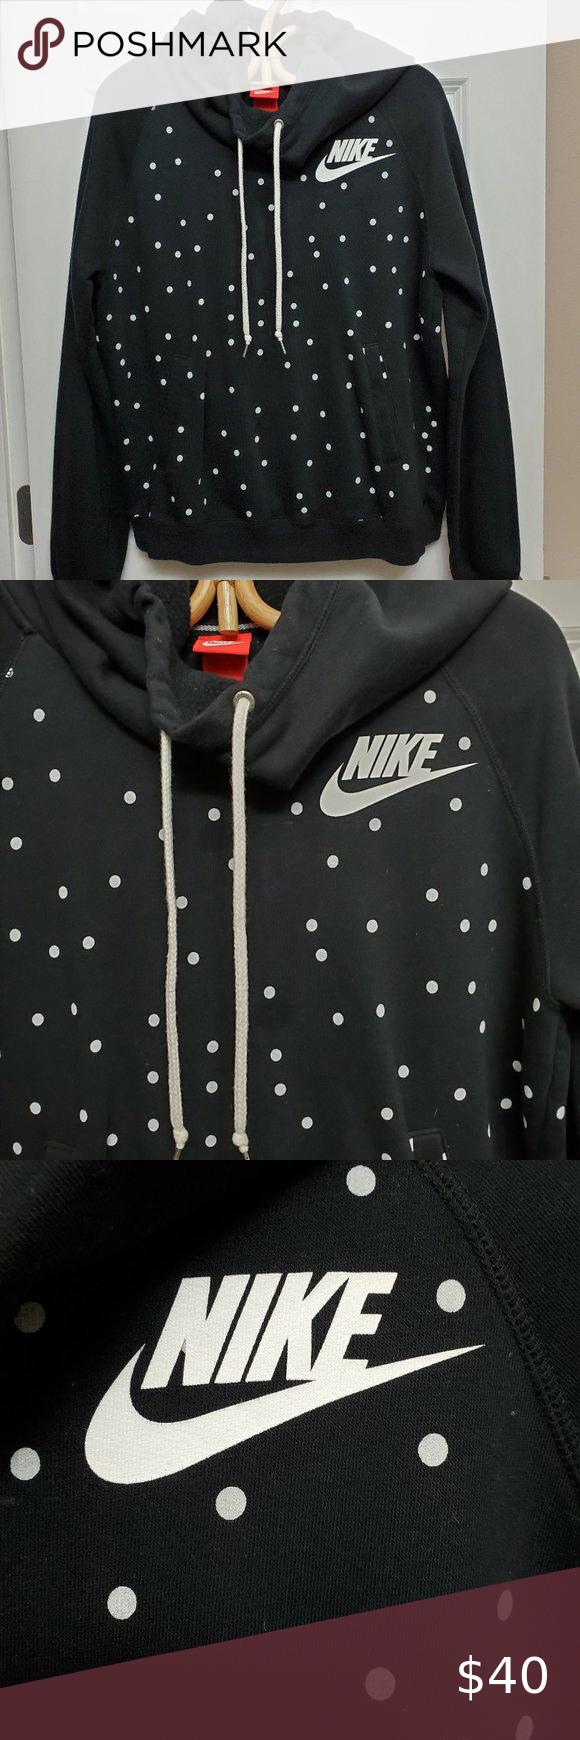 Polka Dot Black Nike Sweashirt L Black Nikes Soft Sweatshirts Hooded Sweatshirts [ 1740 x 580 Pixel ]